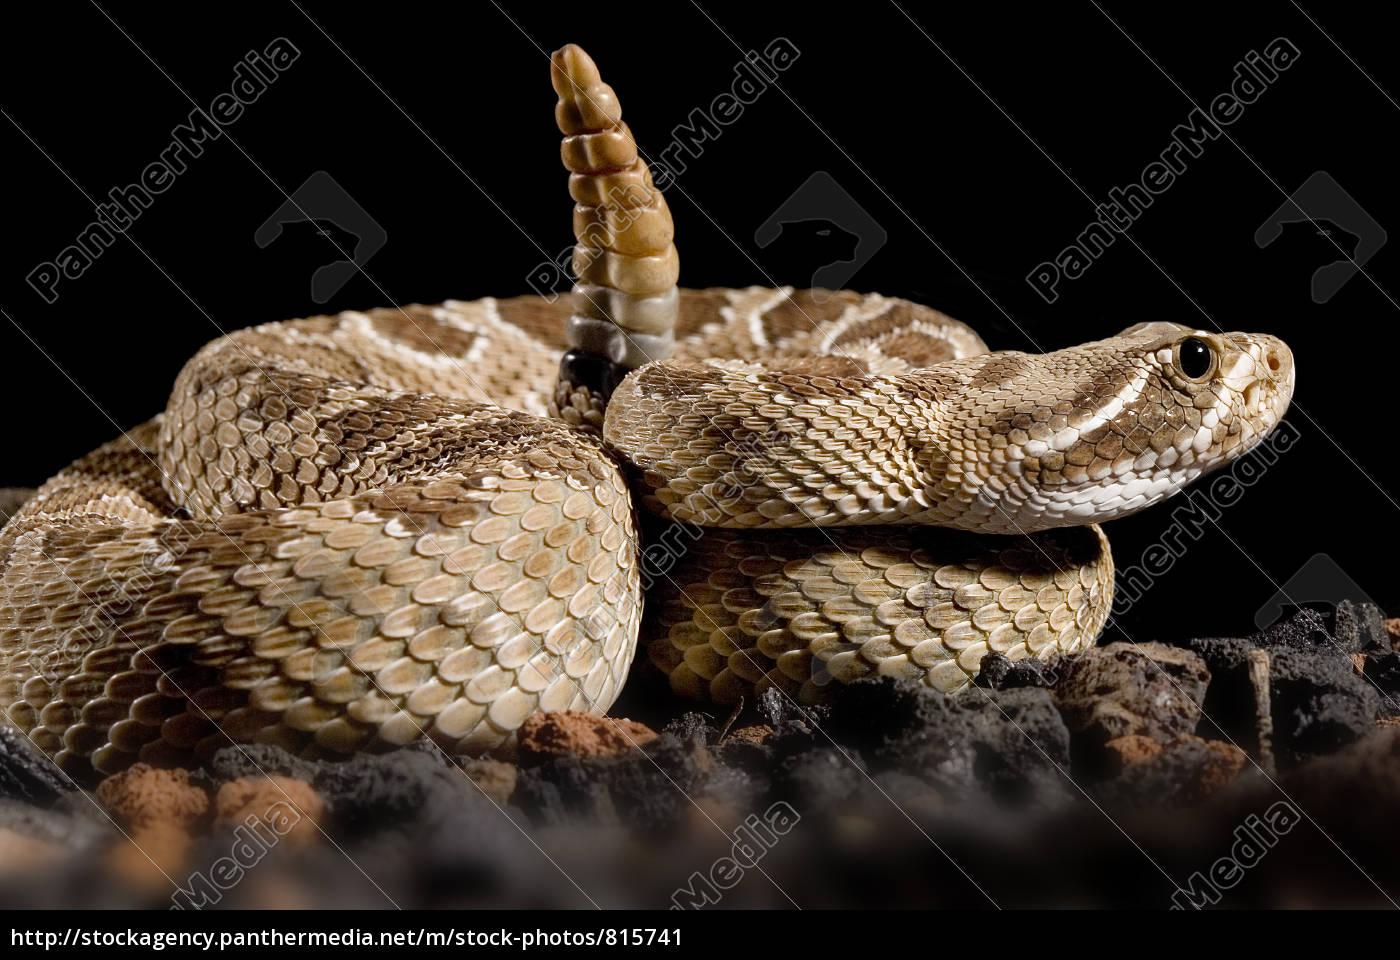 Stock Photo 815741 - crotalus scutulatus rattlesnake